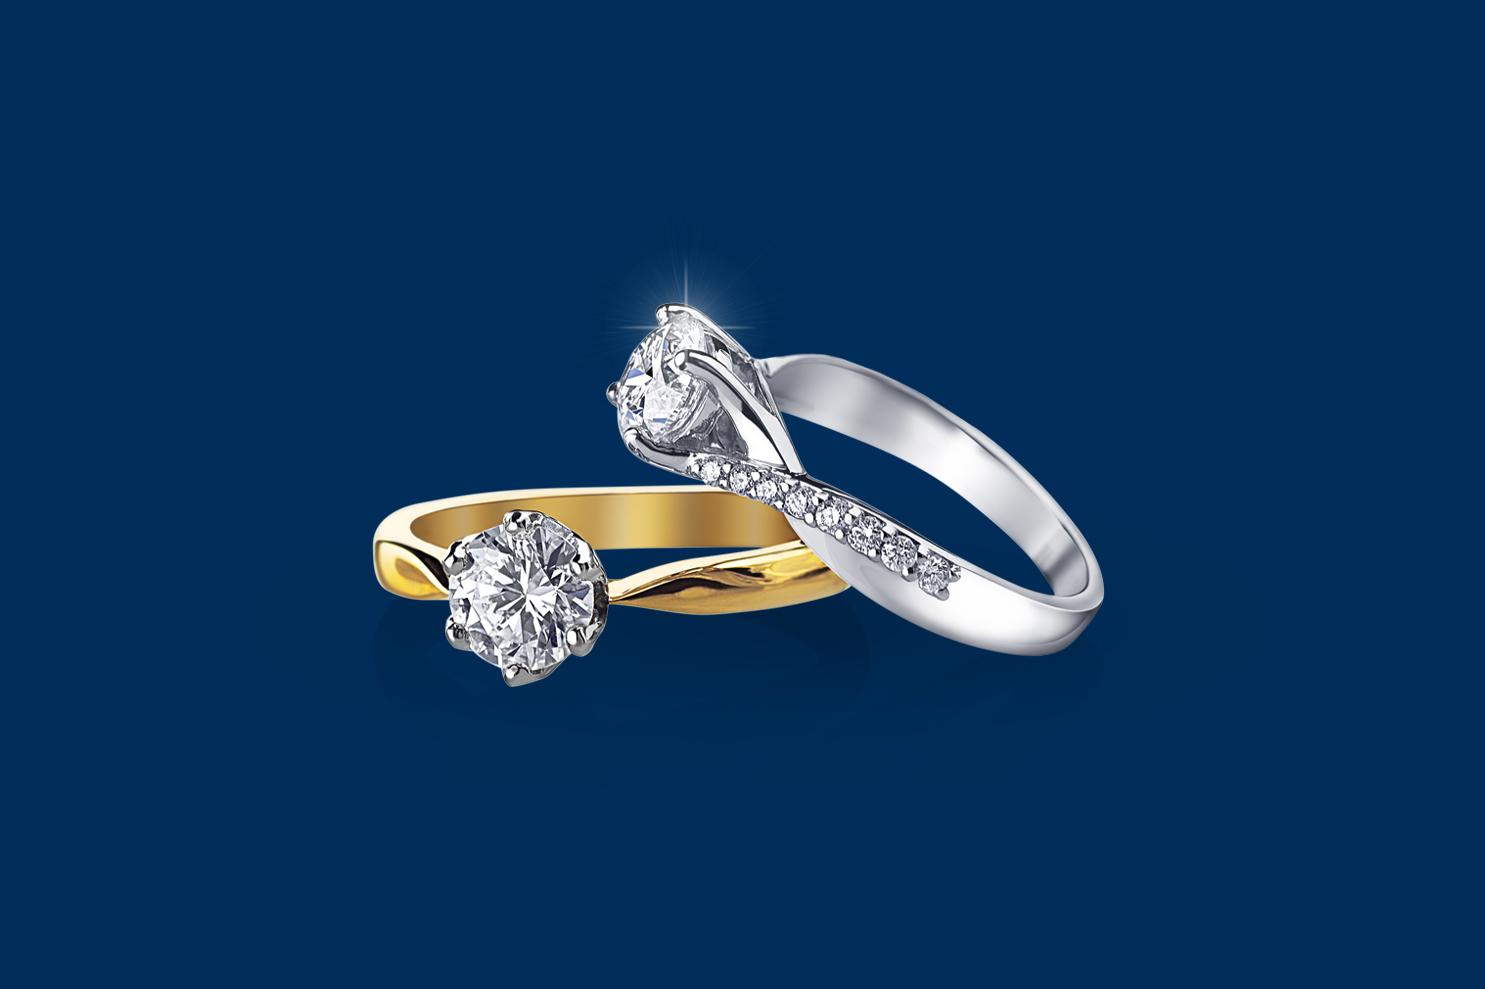 20% Increase in Diamond Jewellery Sales